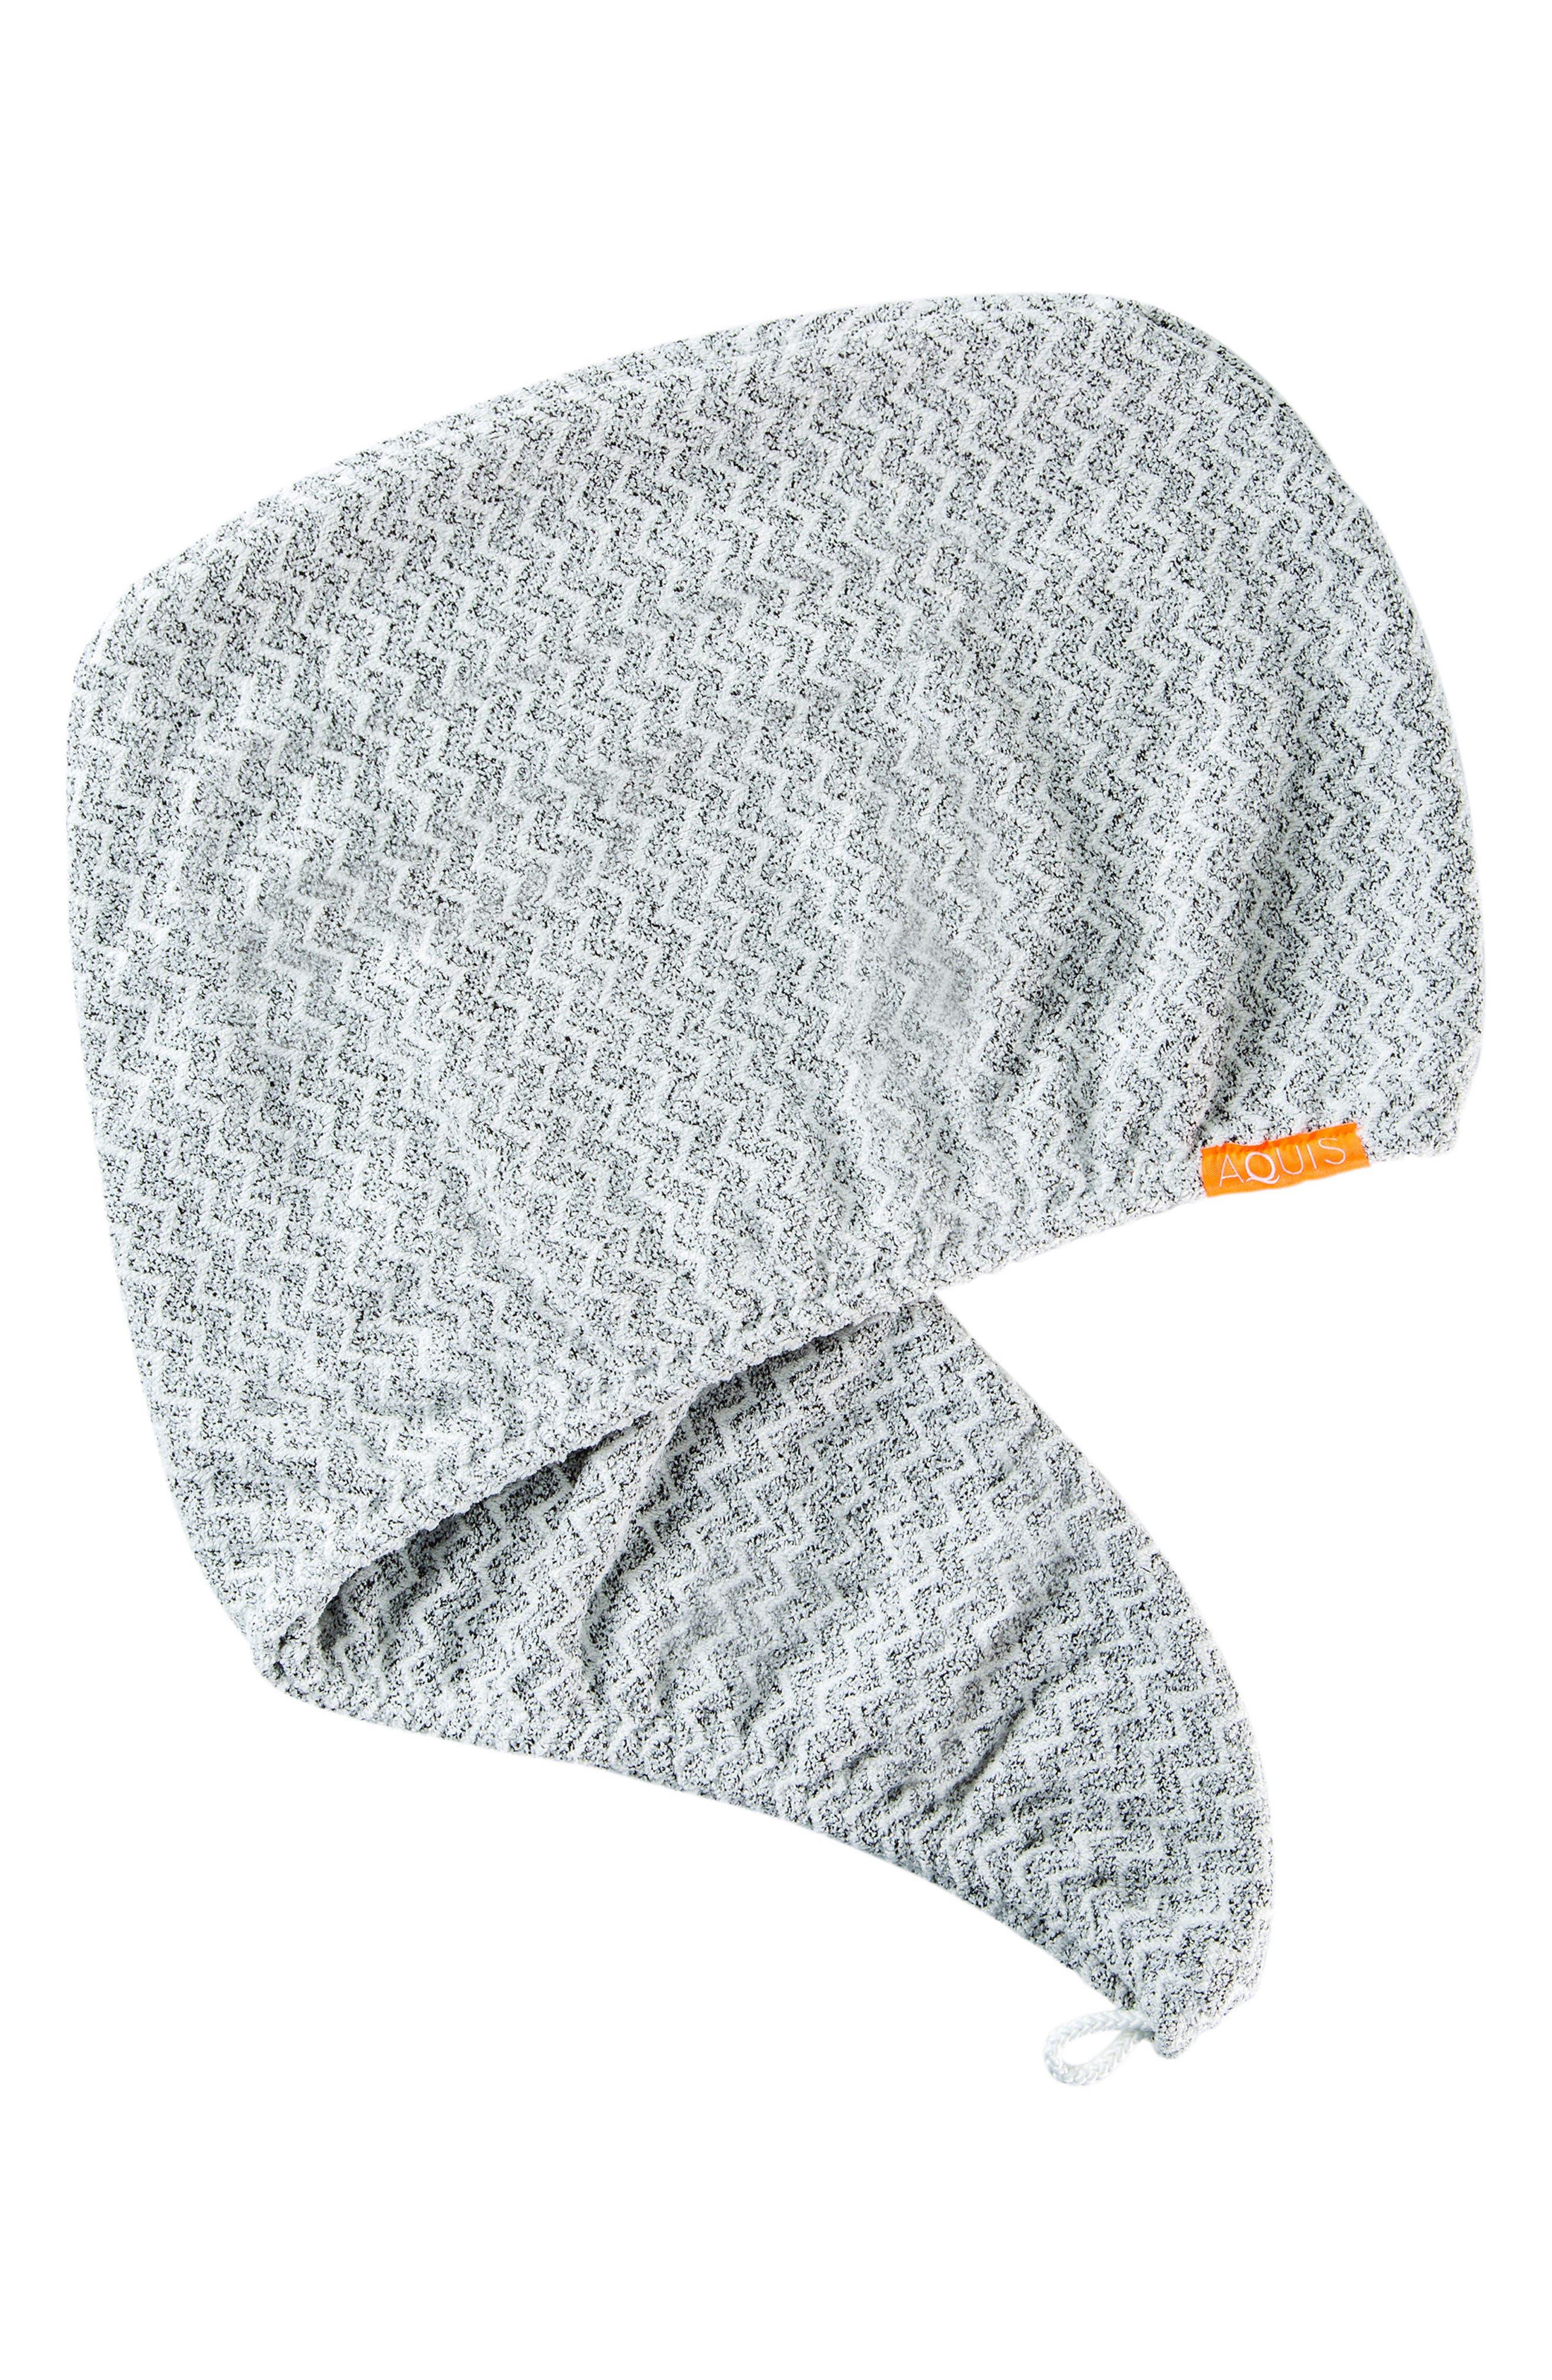 Lisse Luxe Chevron Weave Hair Turban,                             Main thumbnail 1, color,                             CHEVRON